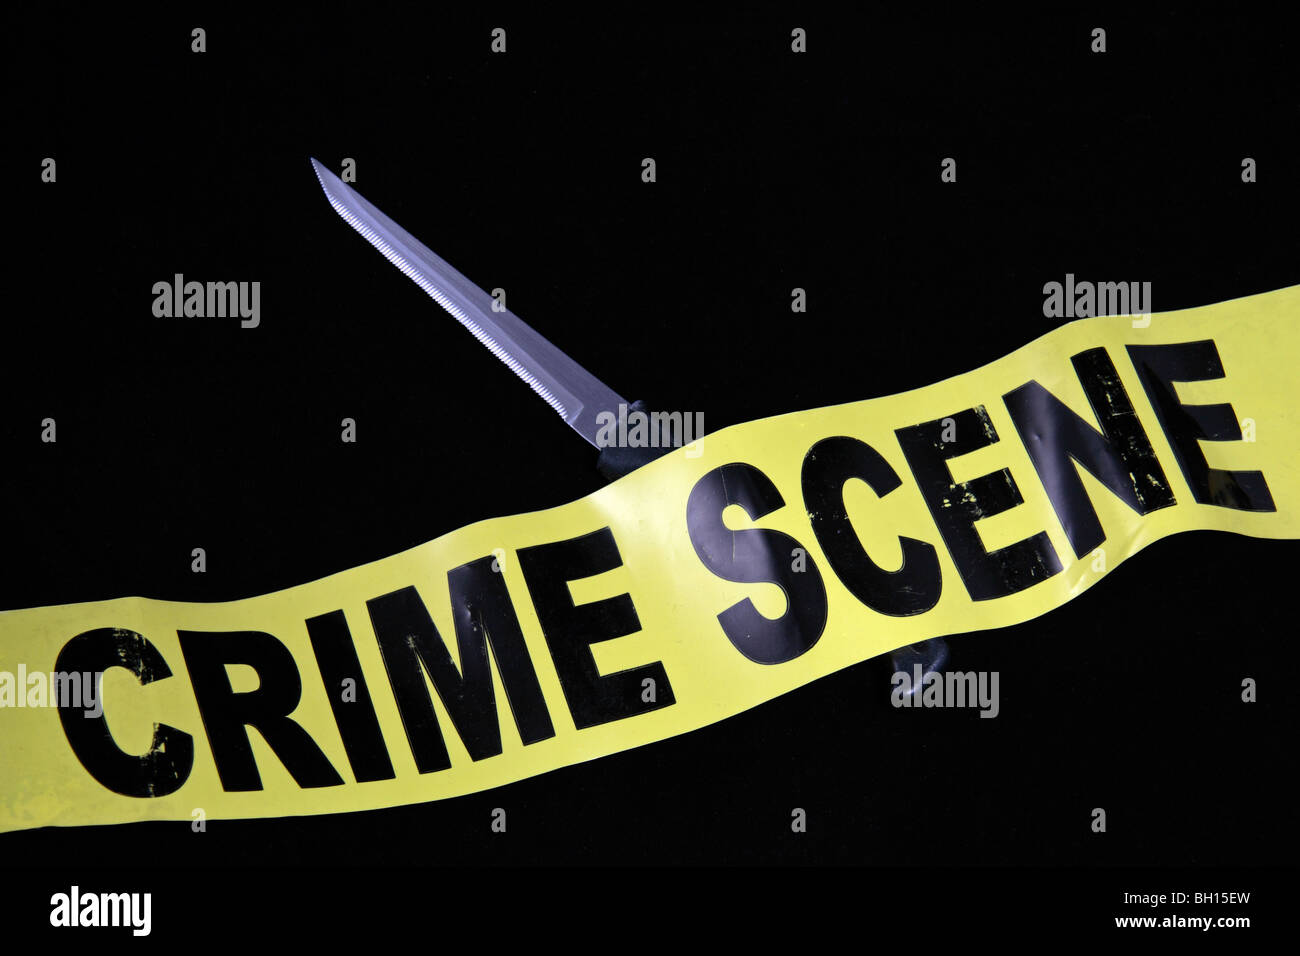 Crime Scene (Do Not Cross) tape lying on a serrated kitchen knife.  United Kingdom (UK). Jan 2010 - Stock Image